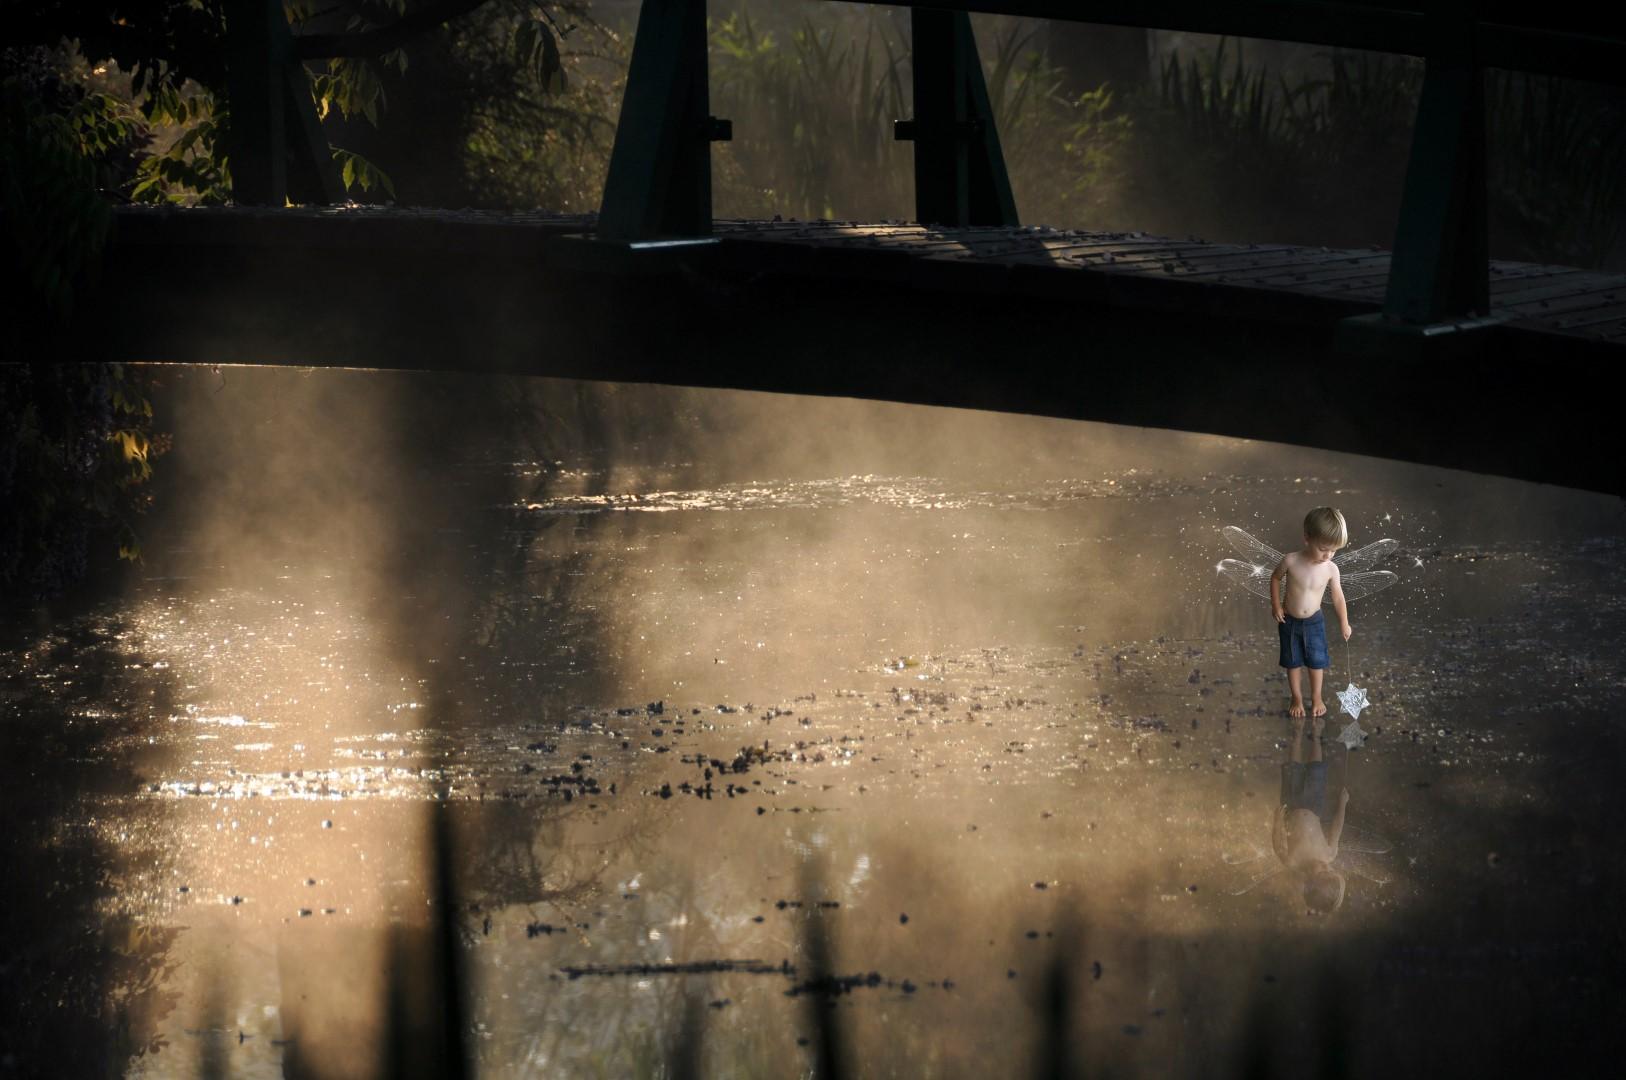 Giverny Monet Garden - Part 3